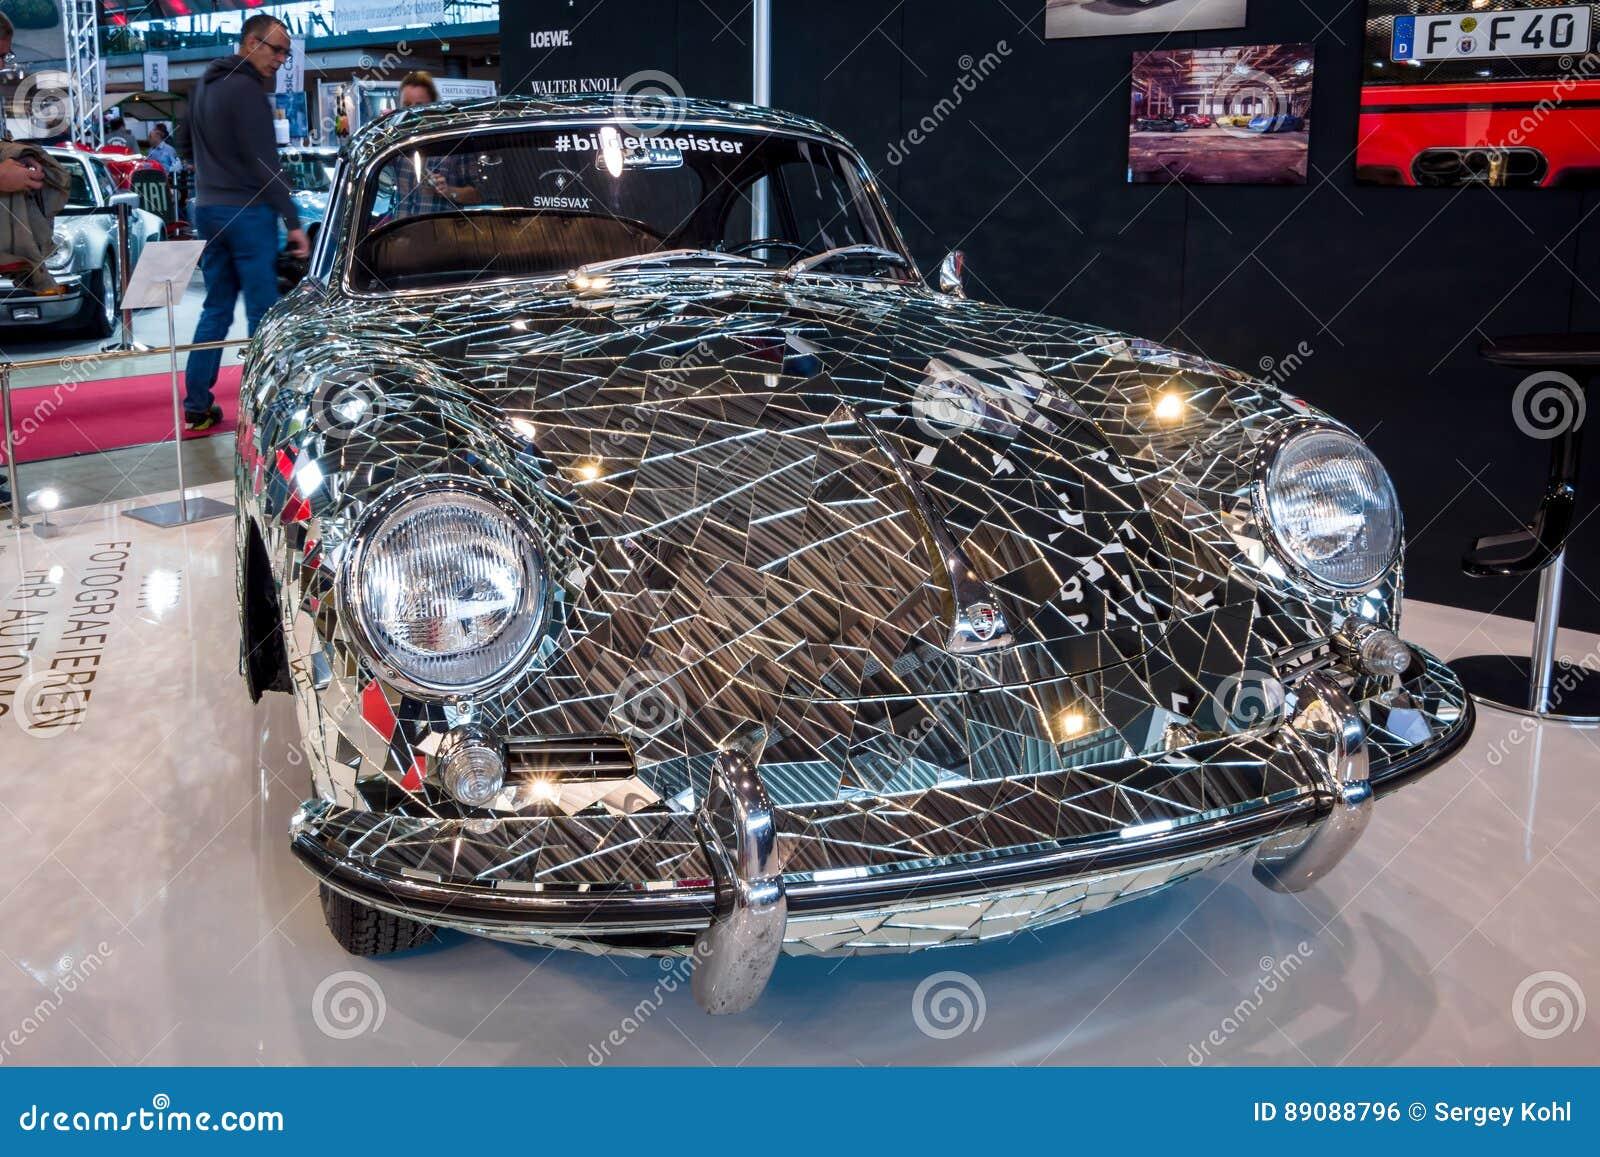 Art Installation Mirror Car Based On Porsche 356 By Artist Gustav Troger Mirrorman Editorial Photo Image Of Autotransport Greatest 89088796